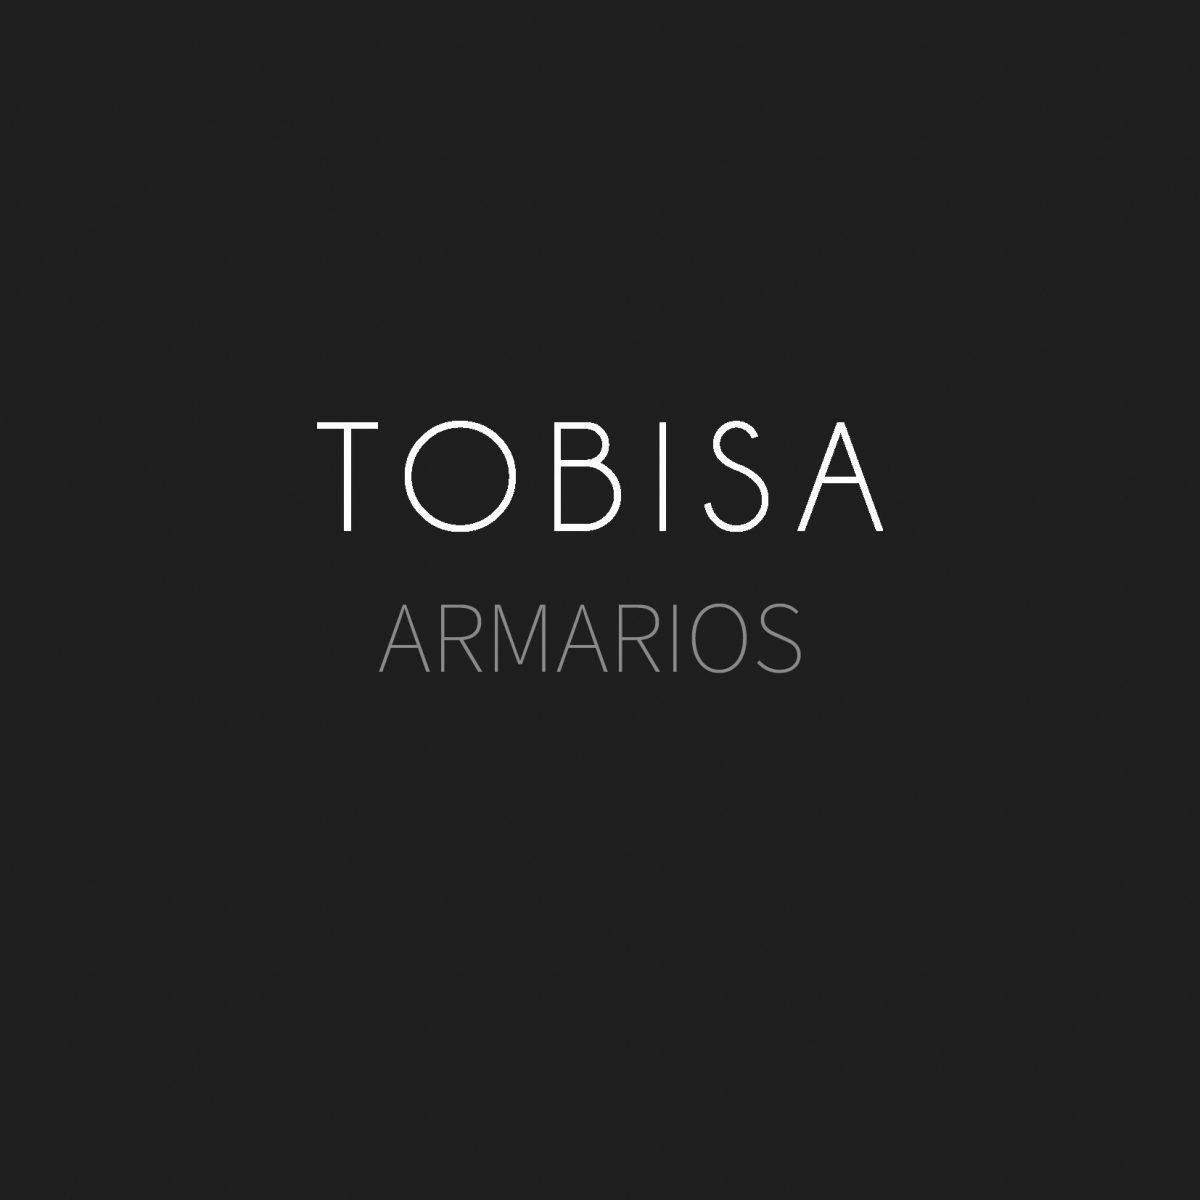 TOBISA ARMARIOS